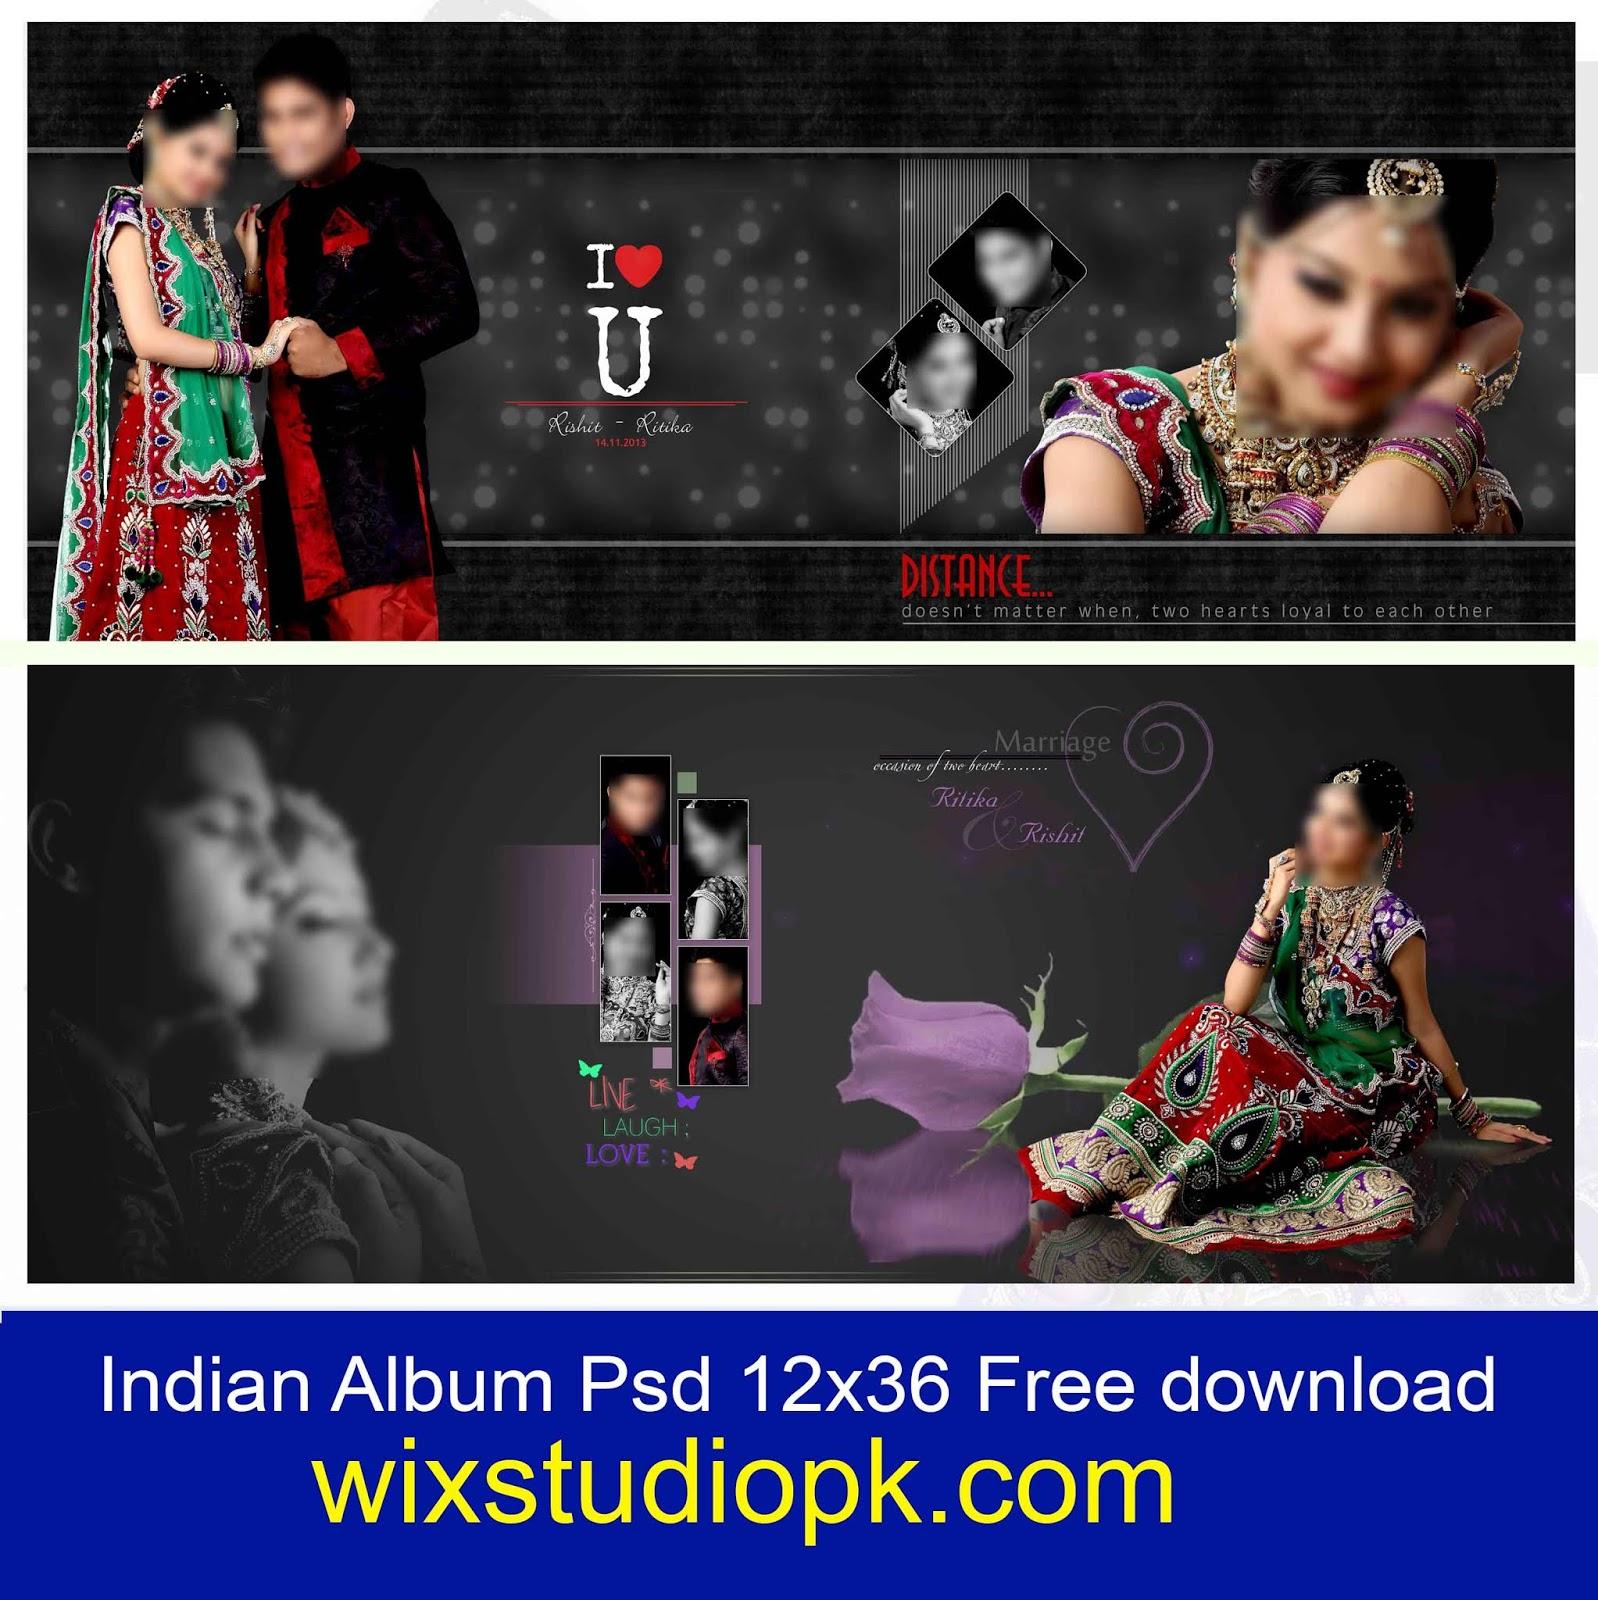 Indian Wedding Album Design 12x36 Psd Files Free Download Wix Studio Pk